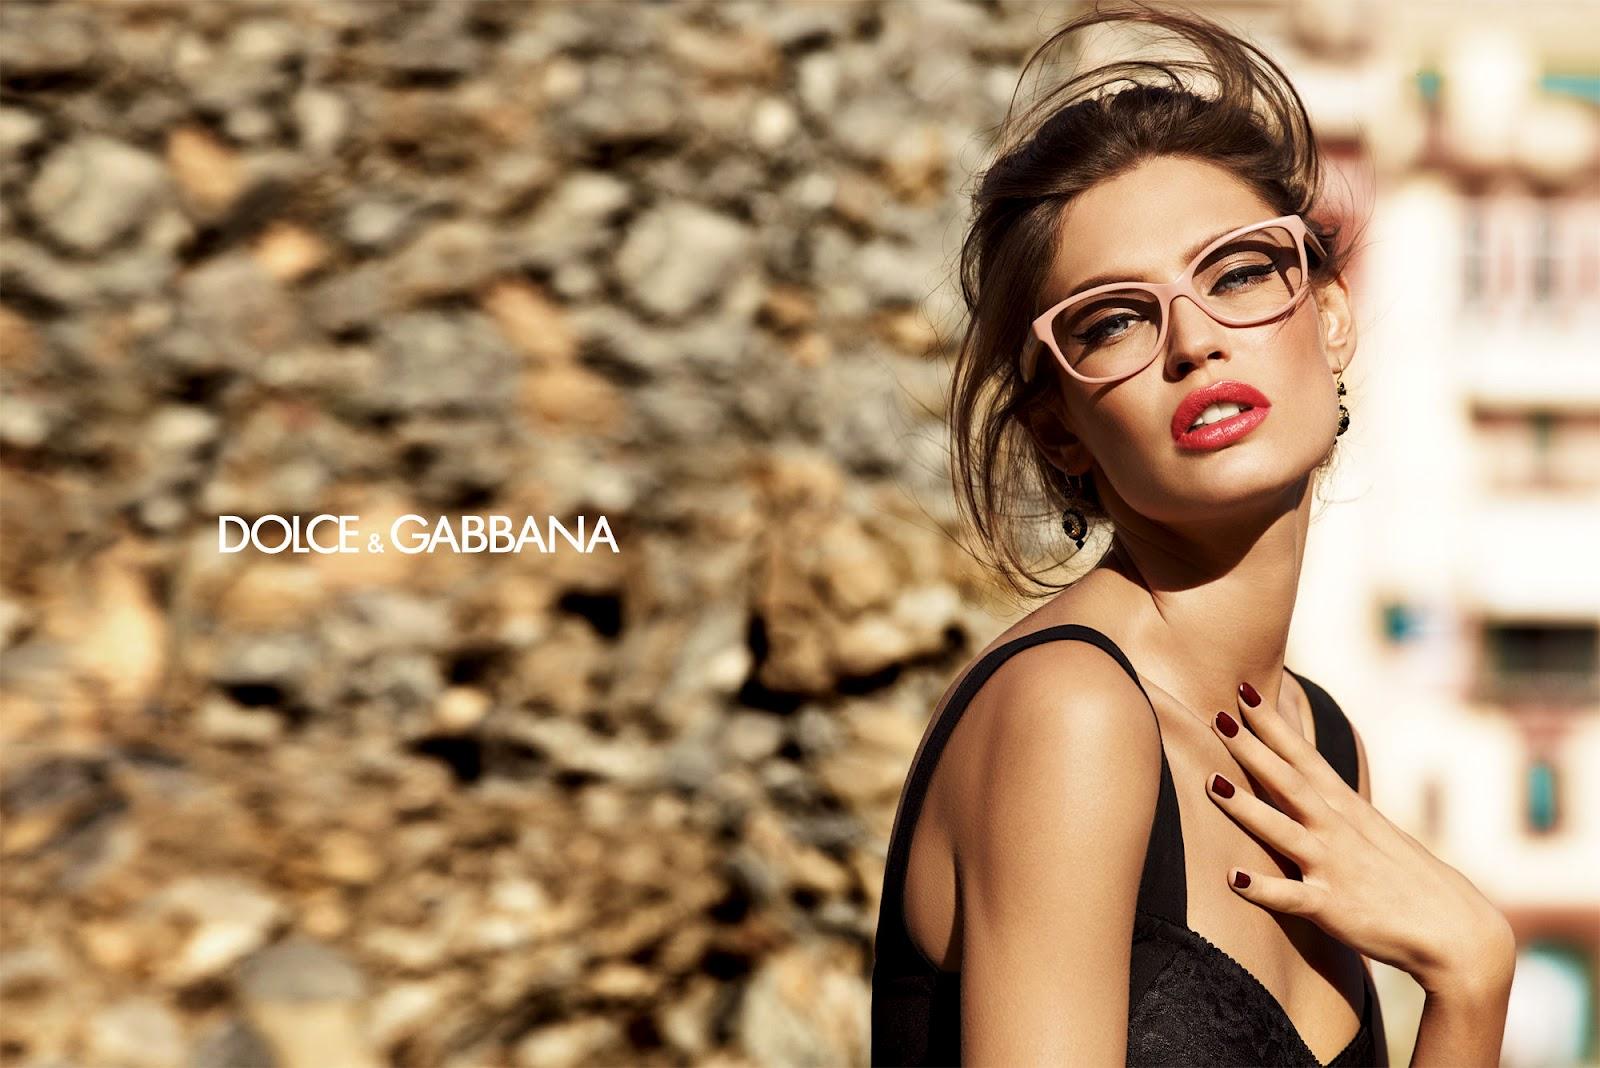 bianca balti and dolce gabbanas new sunglasses line - Dolce Gabbana Frames